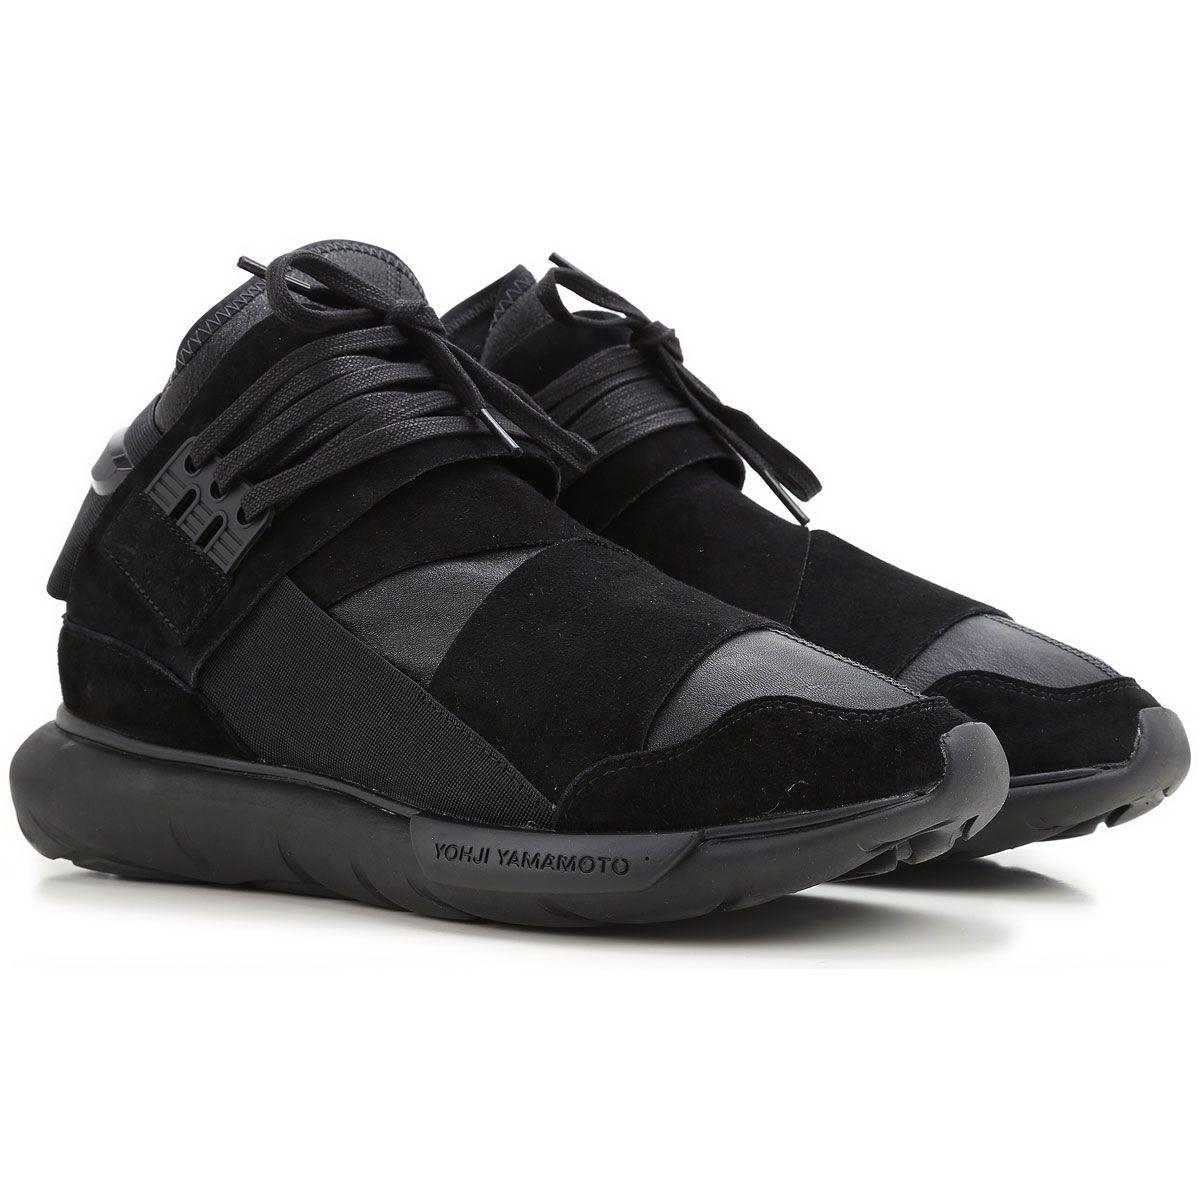 Mens Shoes Y3 by Yohji Yamamoto, Style